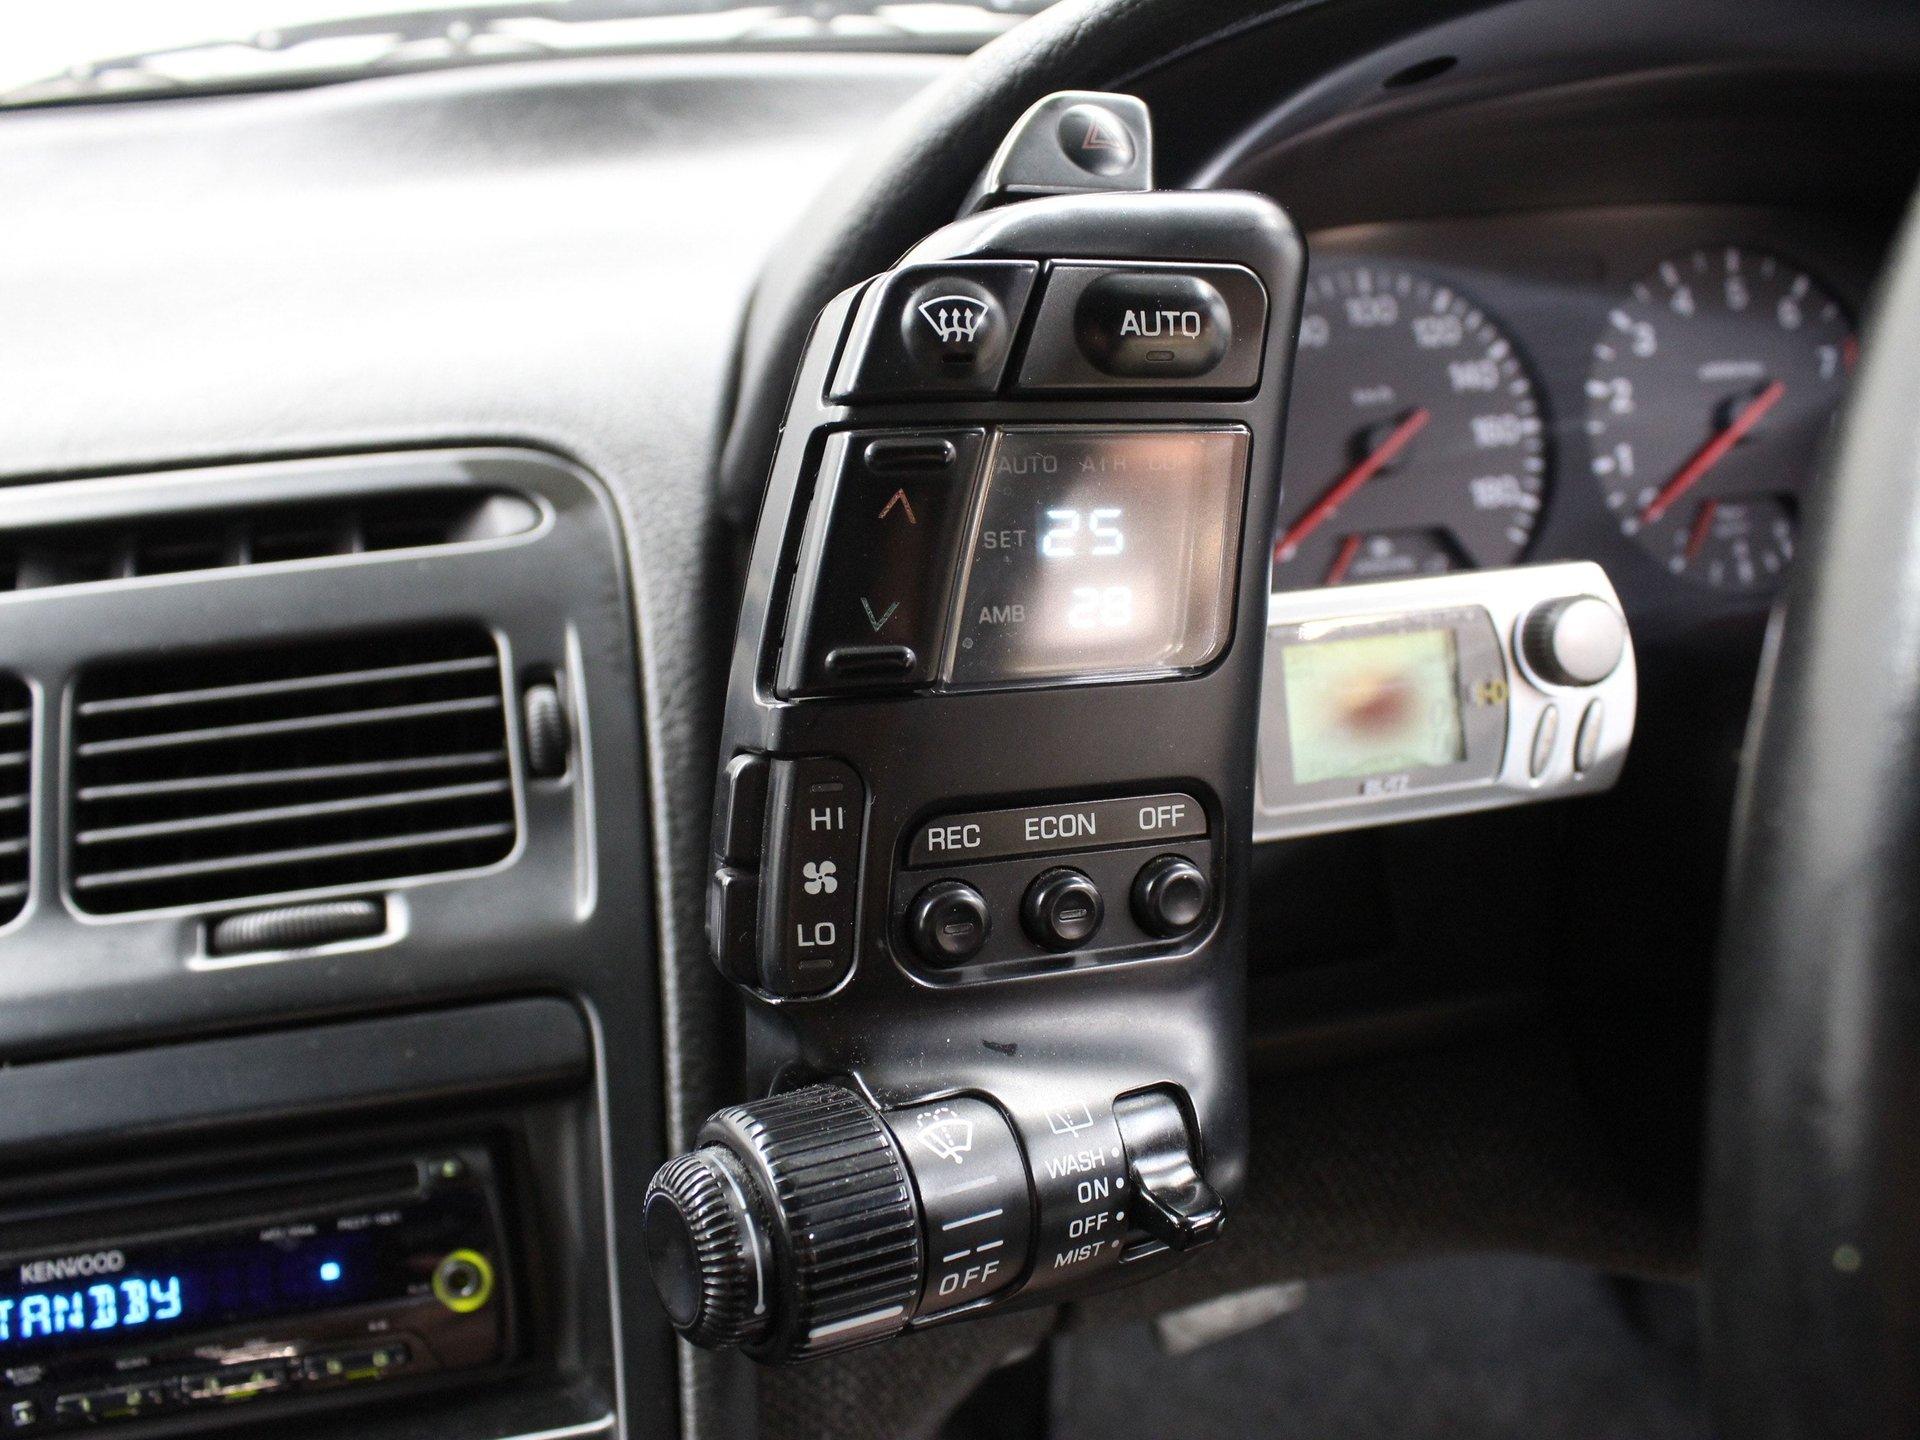 1989 Nissan Fairlady 300ZX